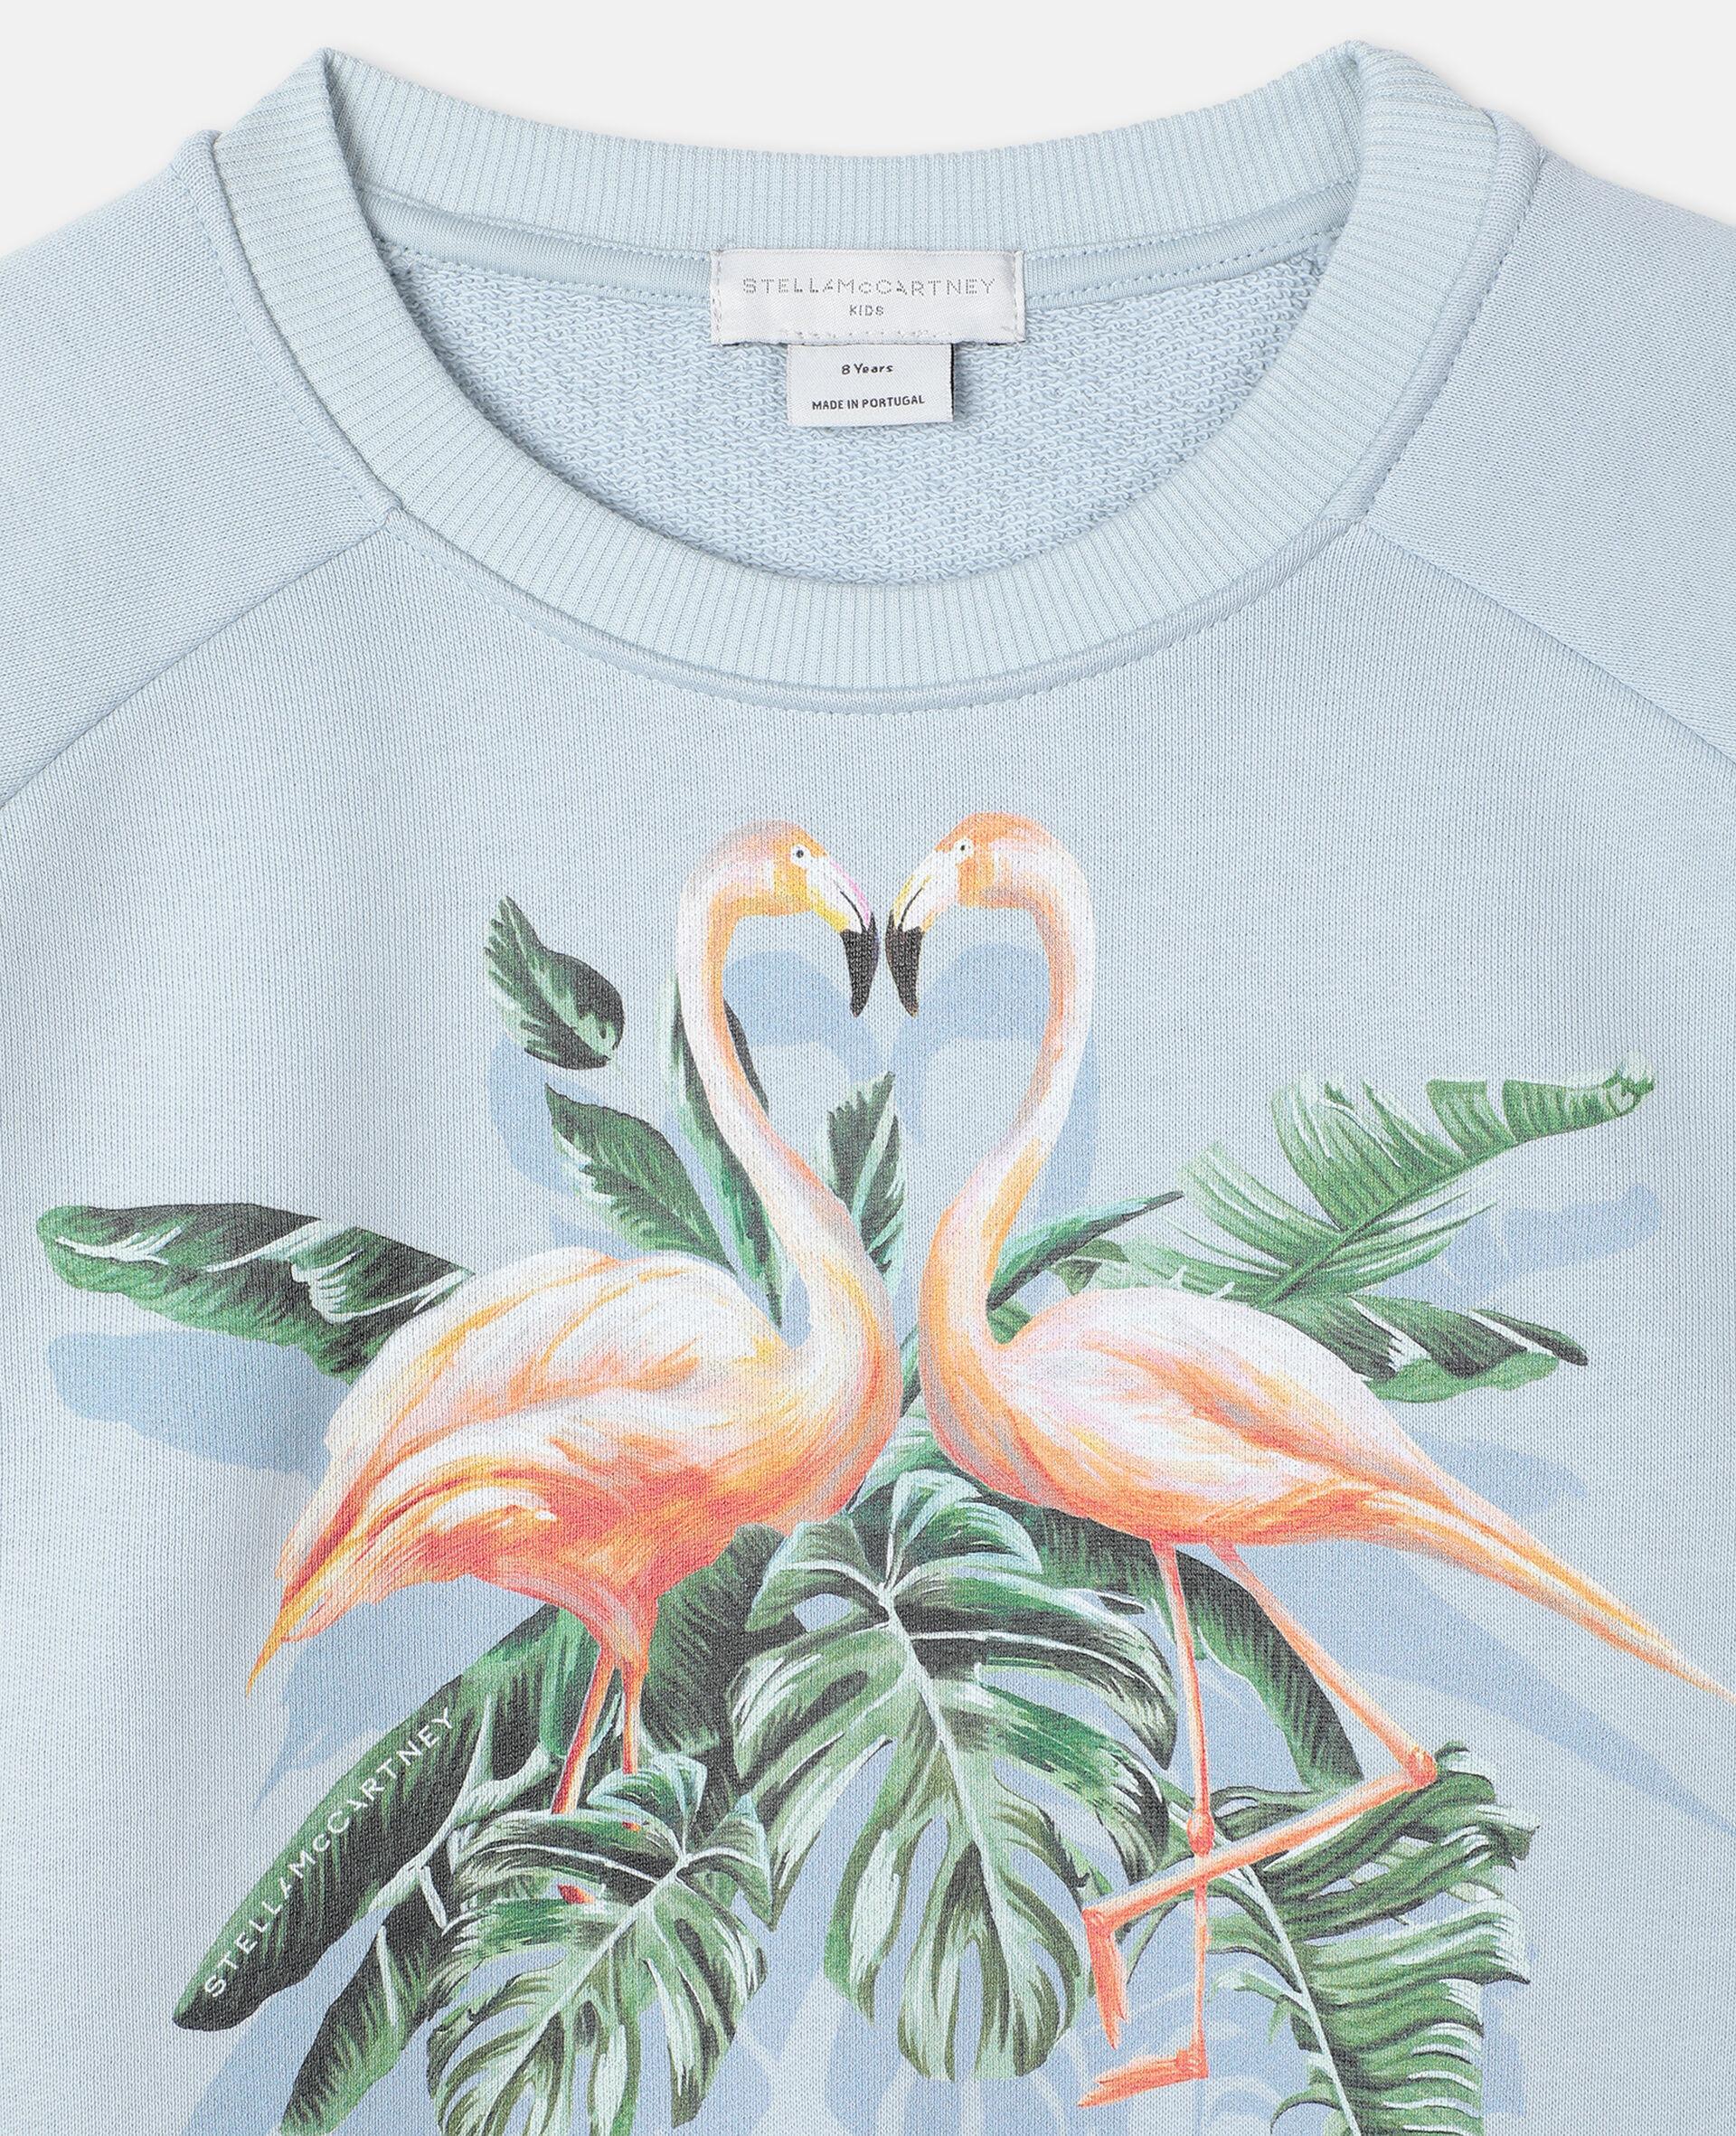 Painty Flamingo棉质抓绒卫衣 -蓝色-large image number 2